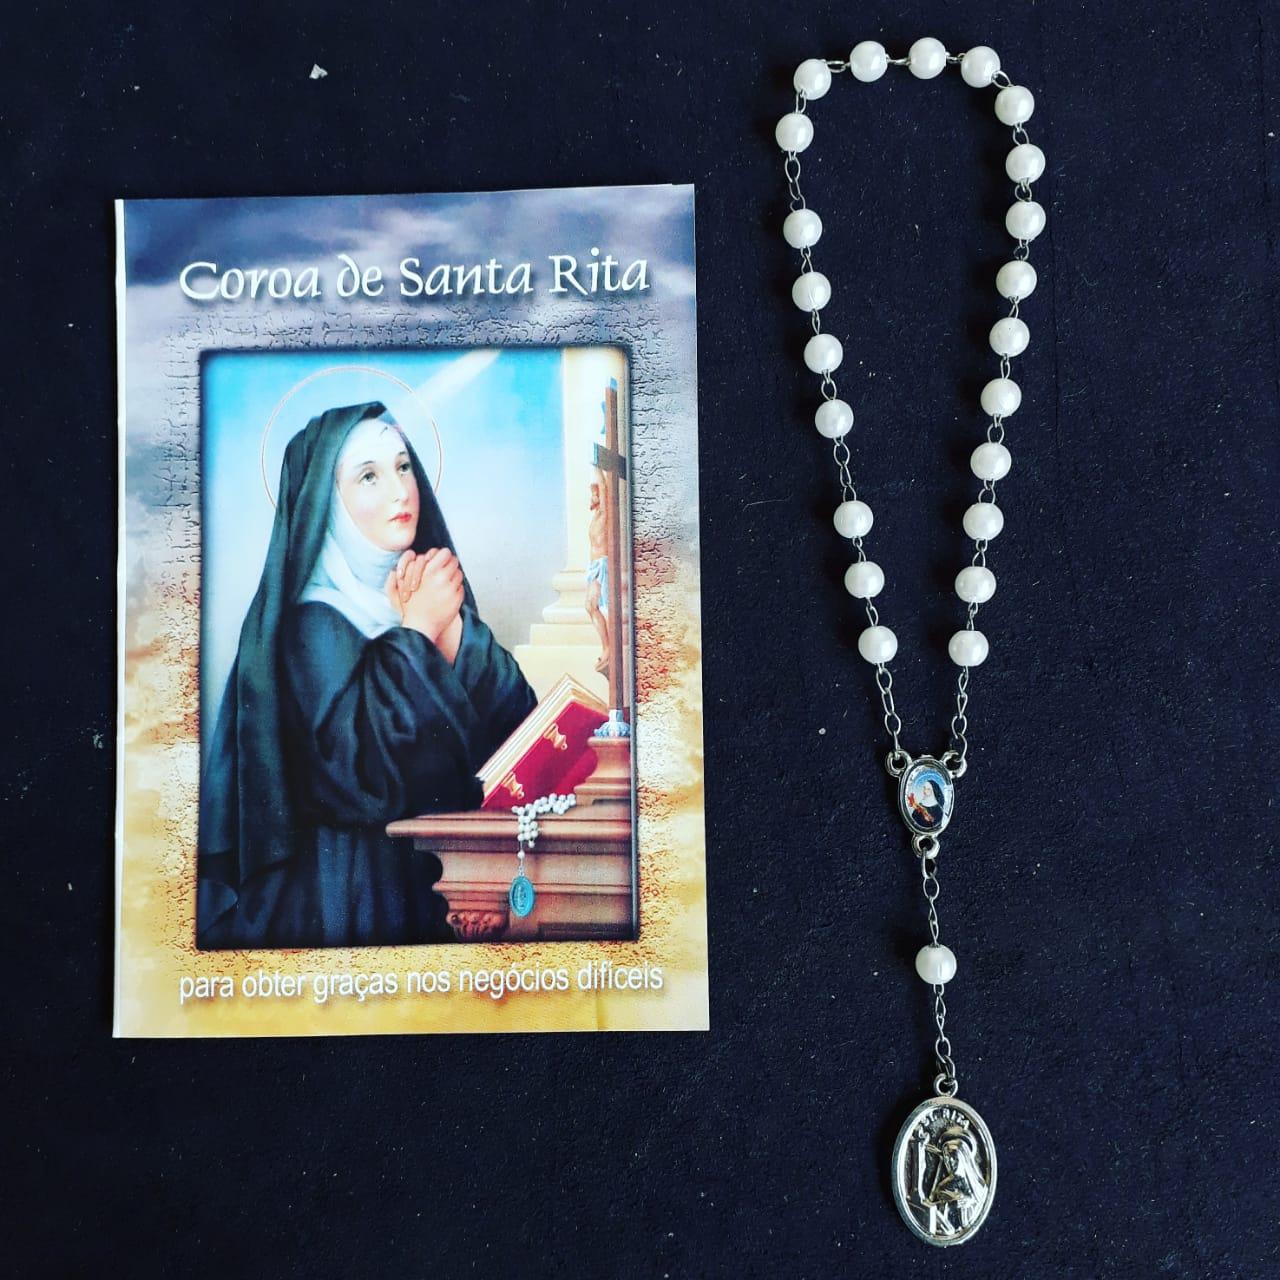 TR22 - Coroa de Santa Rita Perola 6mm c/ Oração  - VindVedShop - Distribuidora Catolica